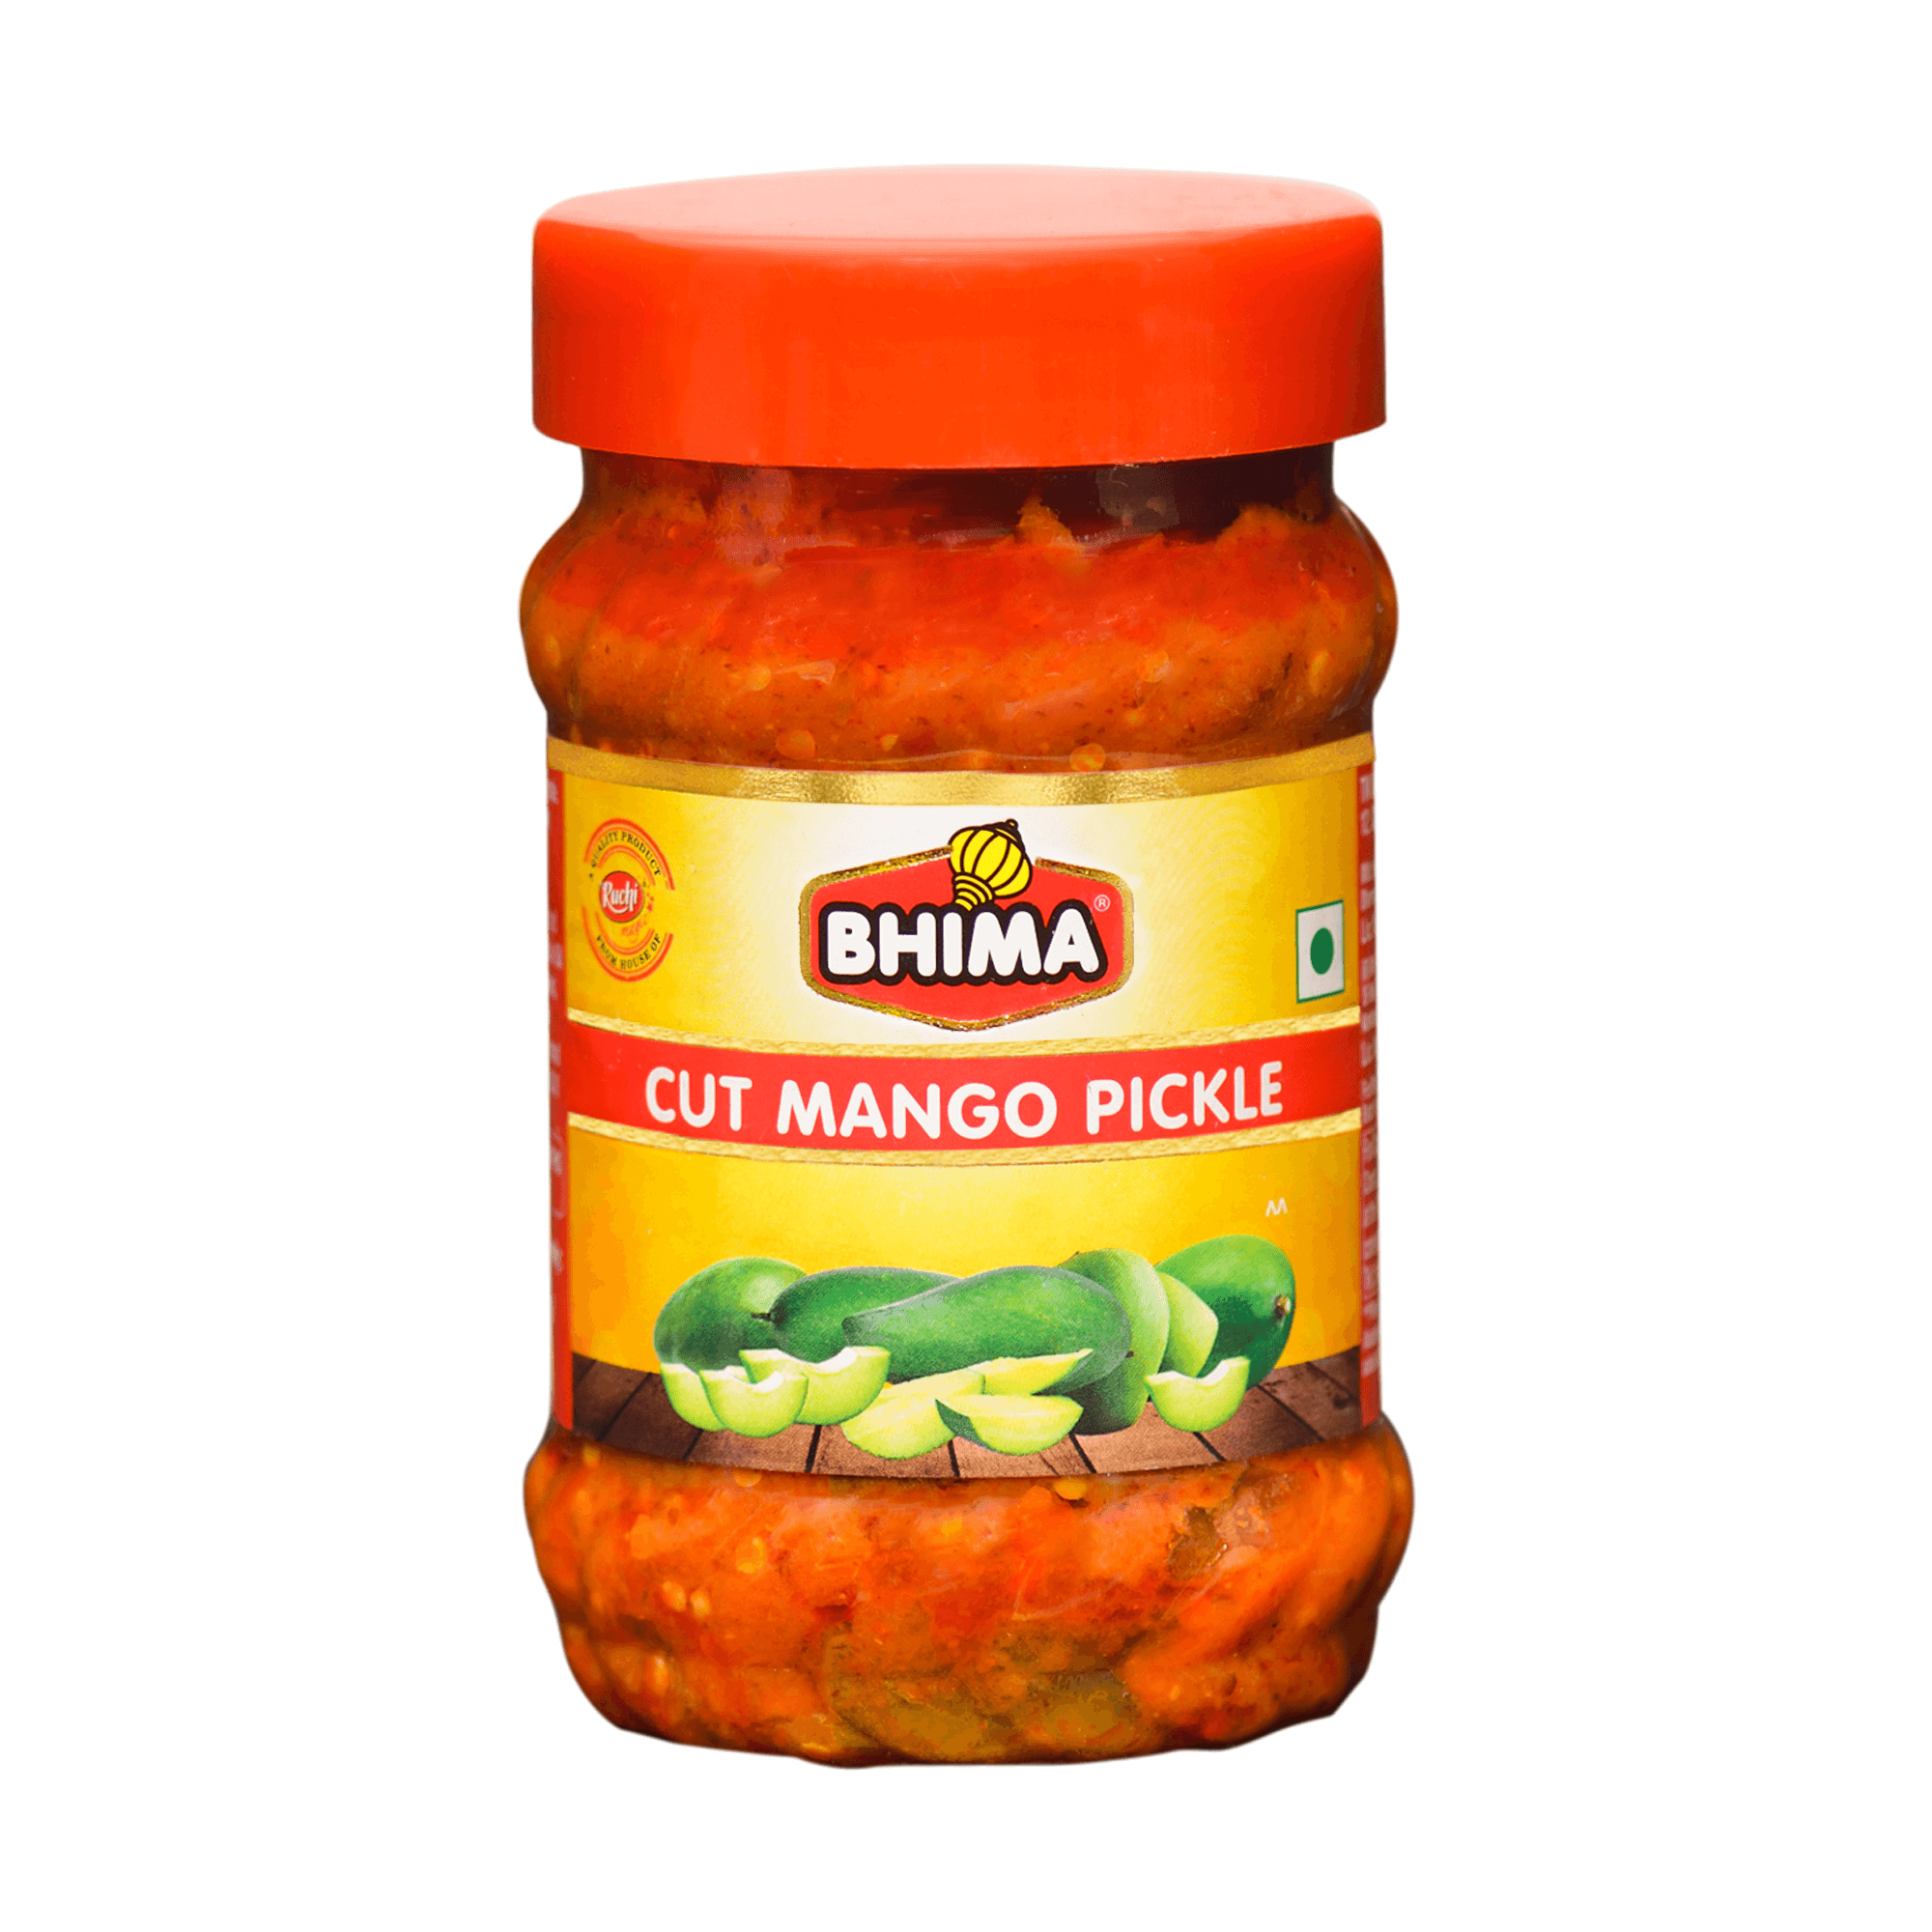 Bhima – Cut Mango